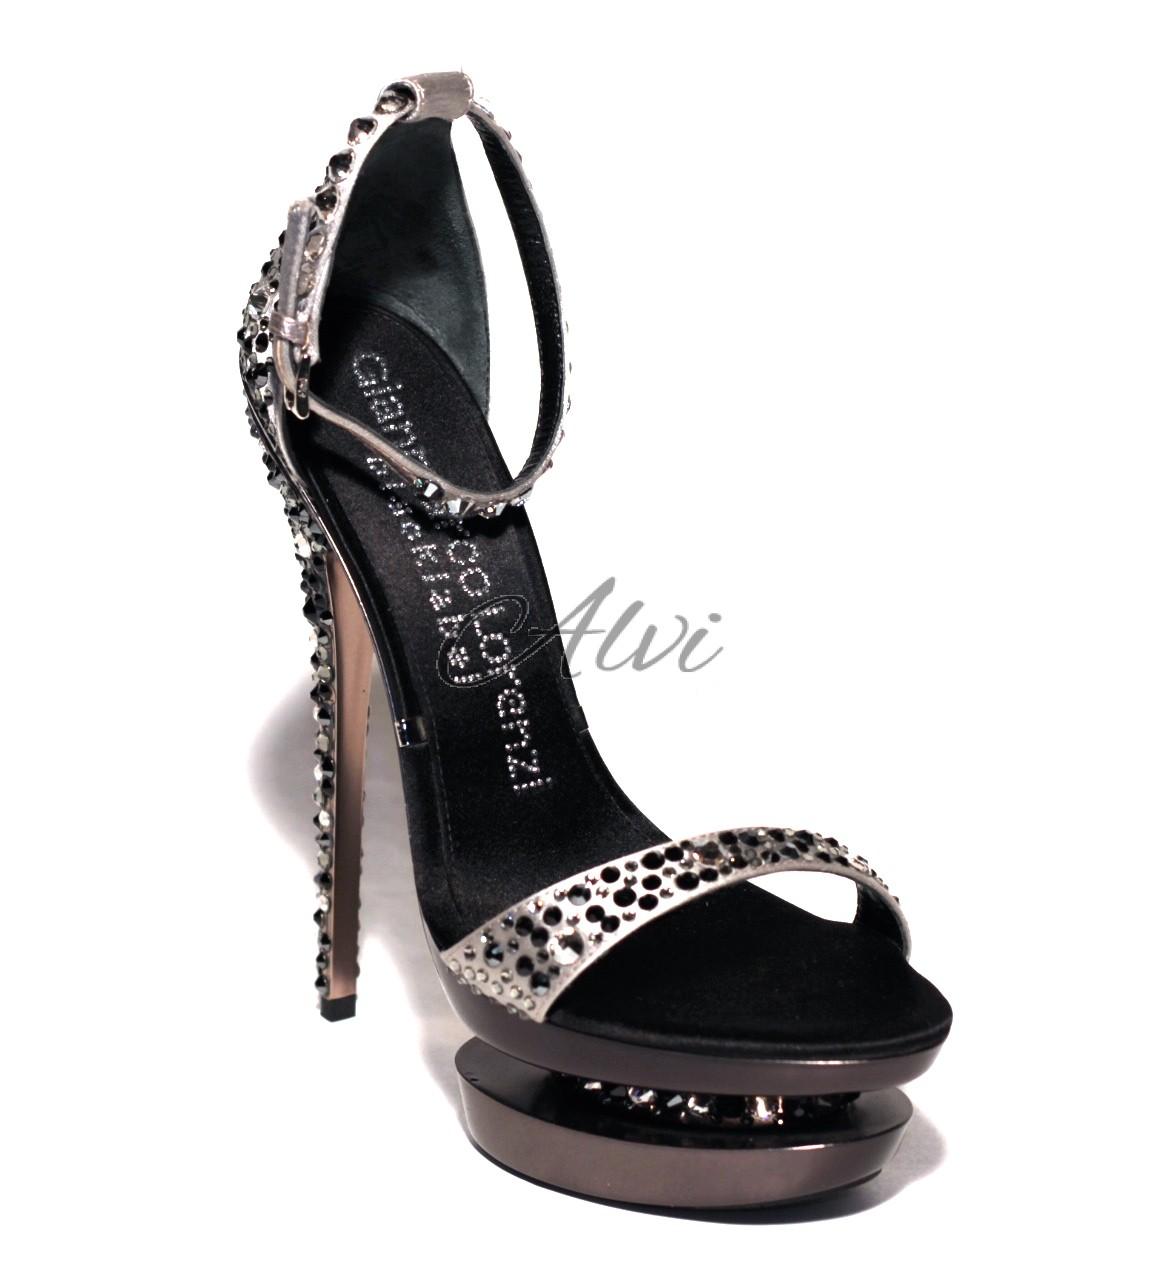 Sandali gioiello Gianmarco Lorenzi